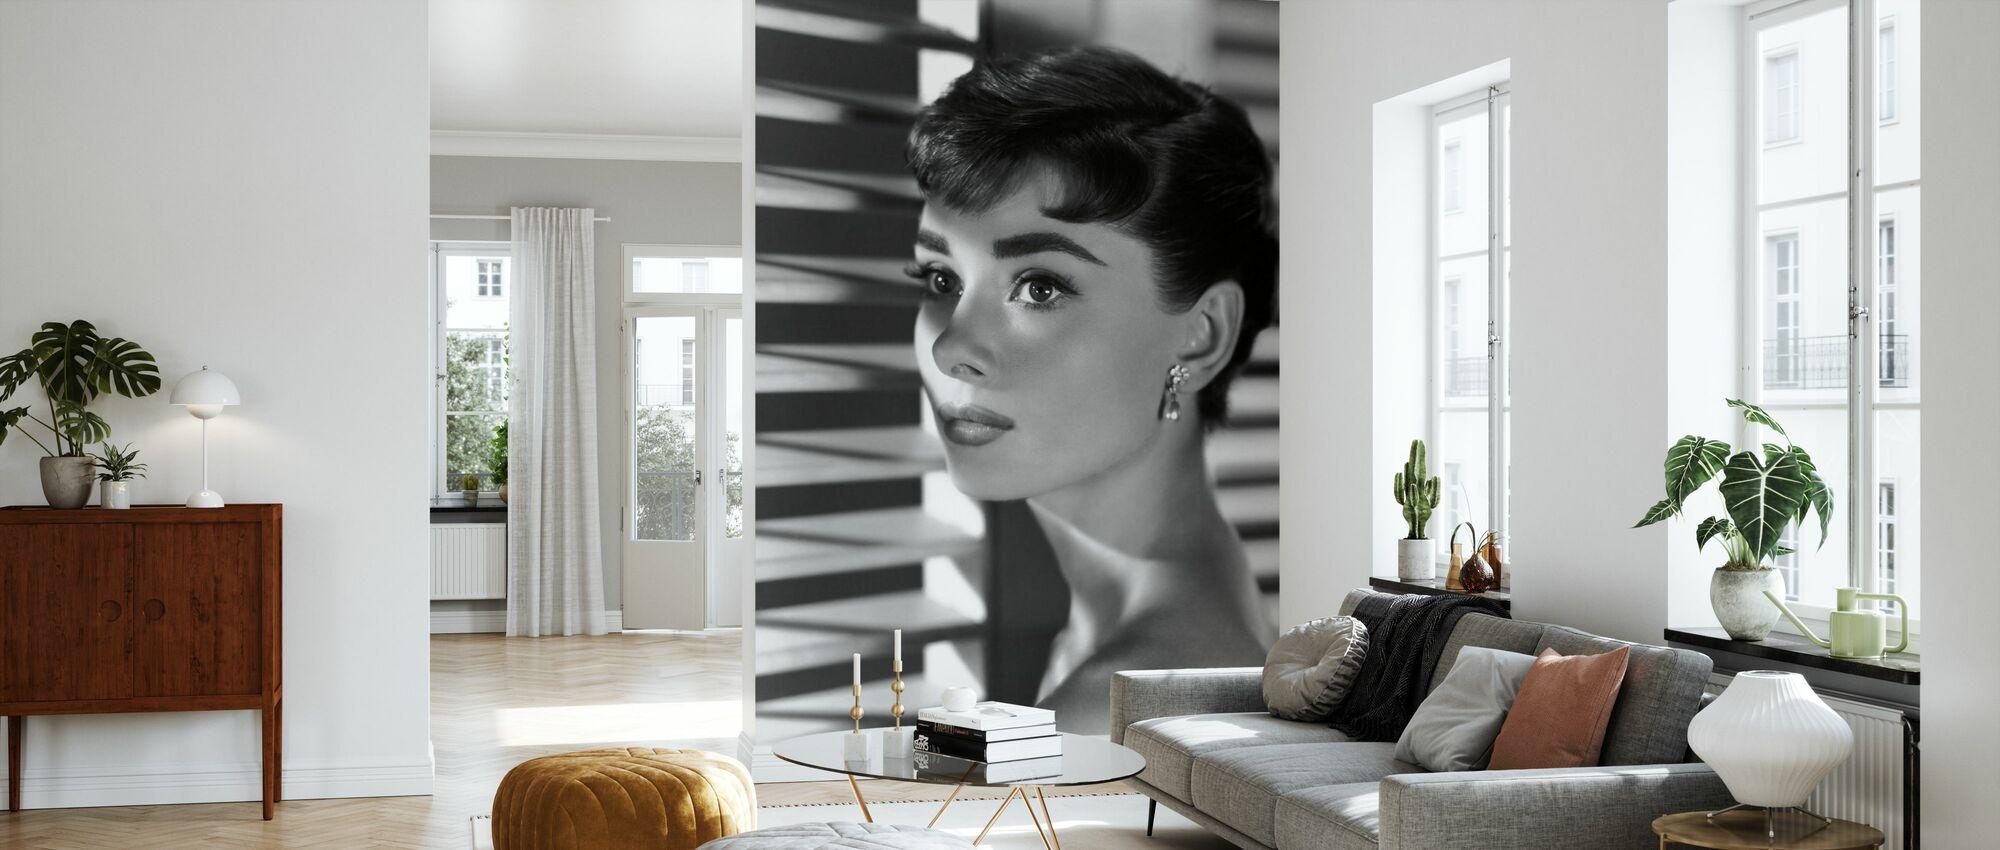 Audrey Hepburn i Sabrina - Tapet - Stue